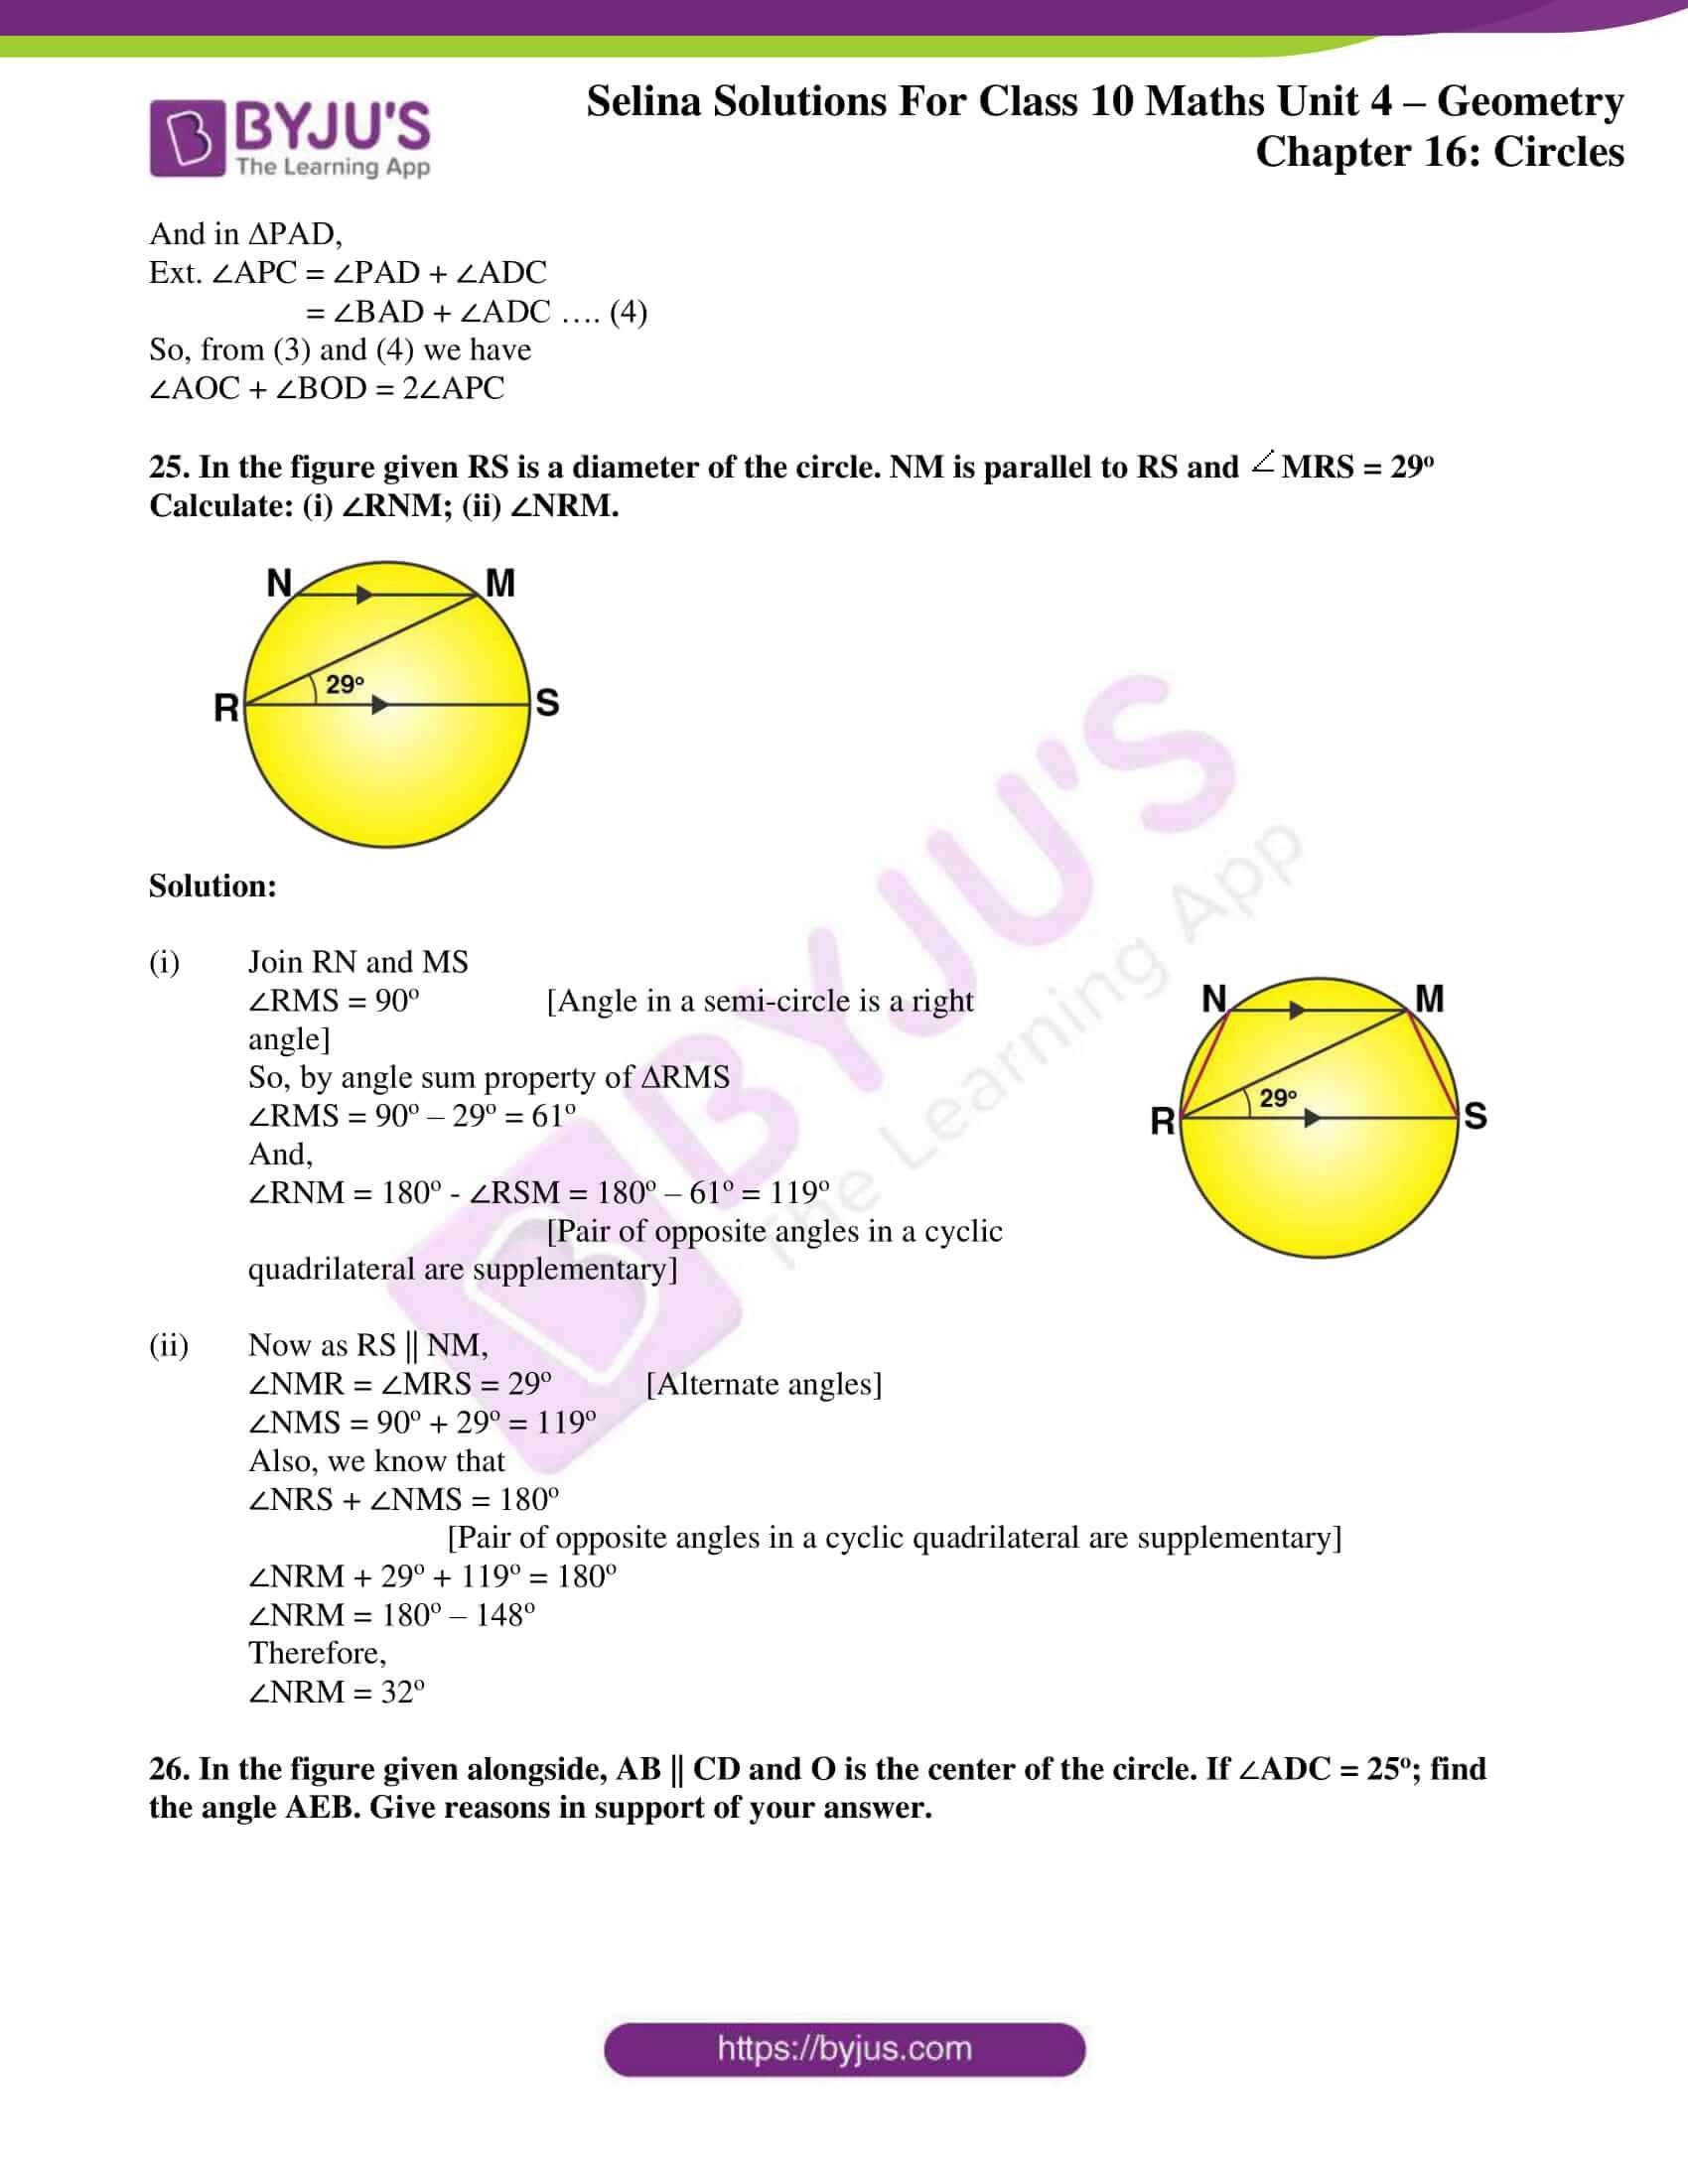 selina-sol-maths-class-10-ch-17-ex-a-14